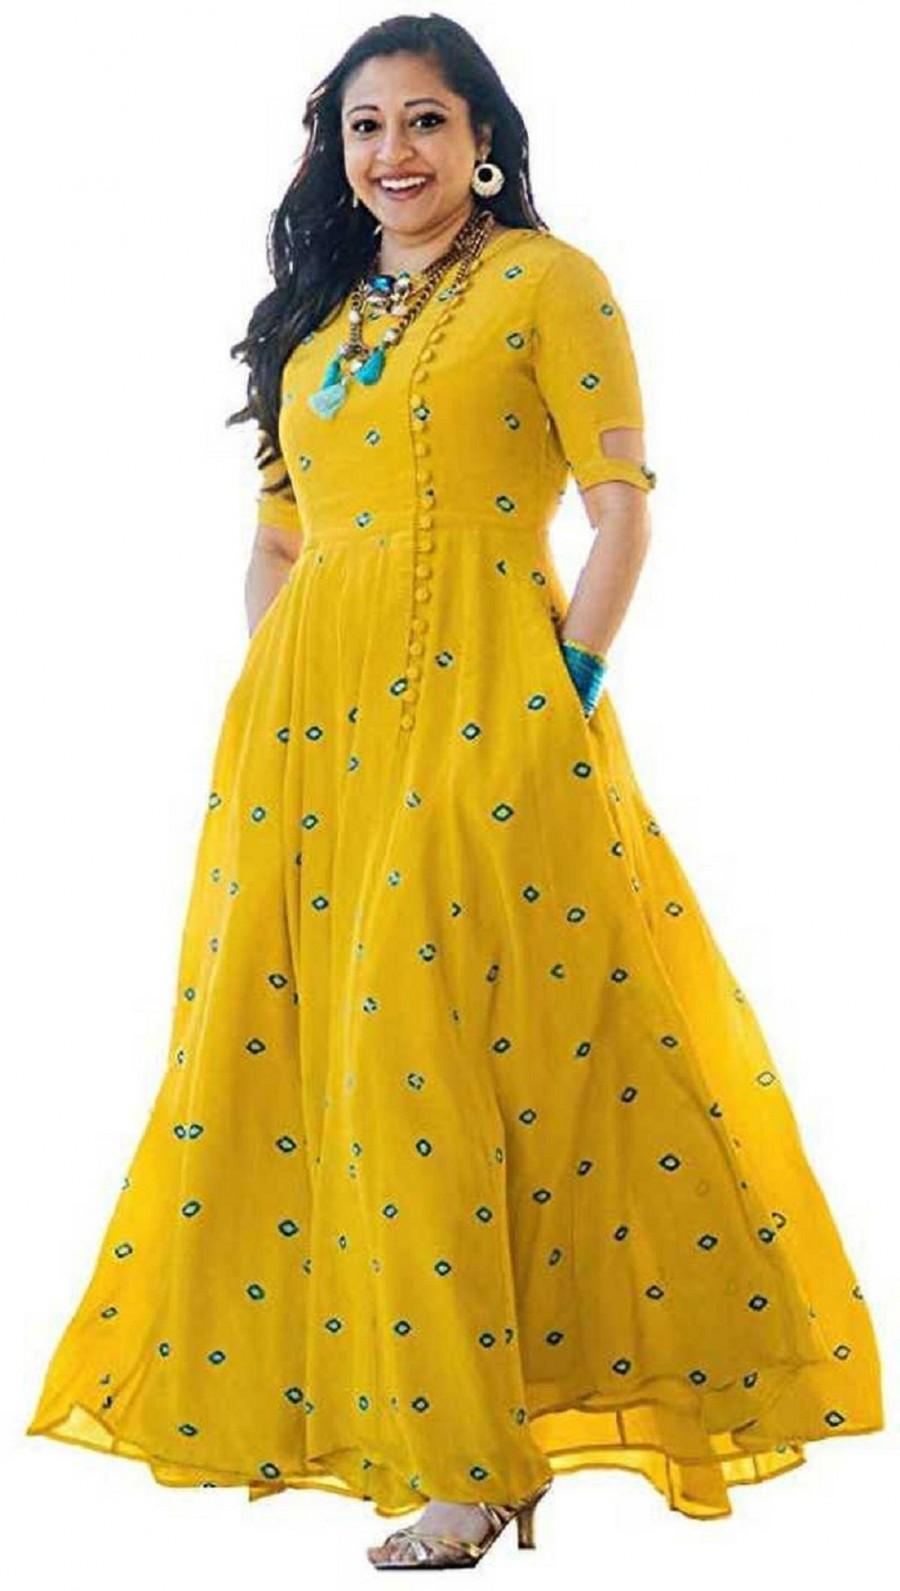 "Hochzeit - Indian Handmade Embroidered Full Mirrror Work Anarkali Rayon Kurti, Yellow Kurtis, Ethnic Kurtis, Pocket Kurtis, ""boho wedding dress"""